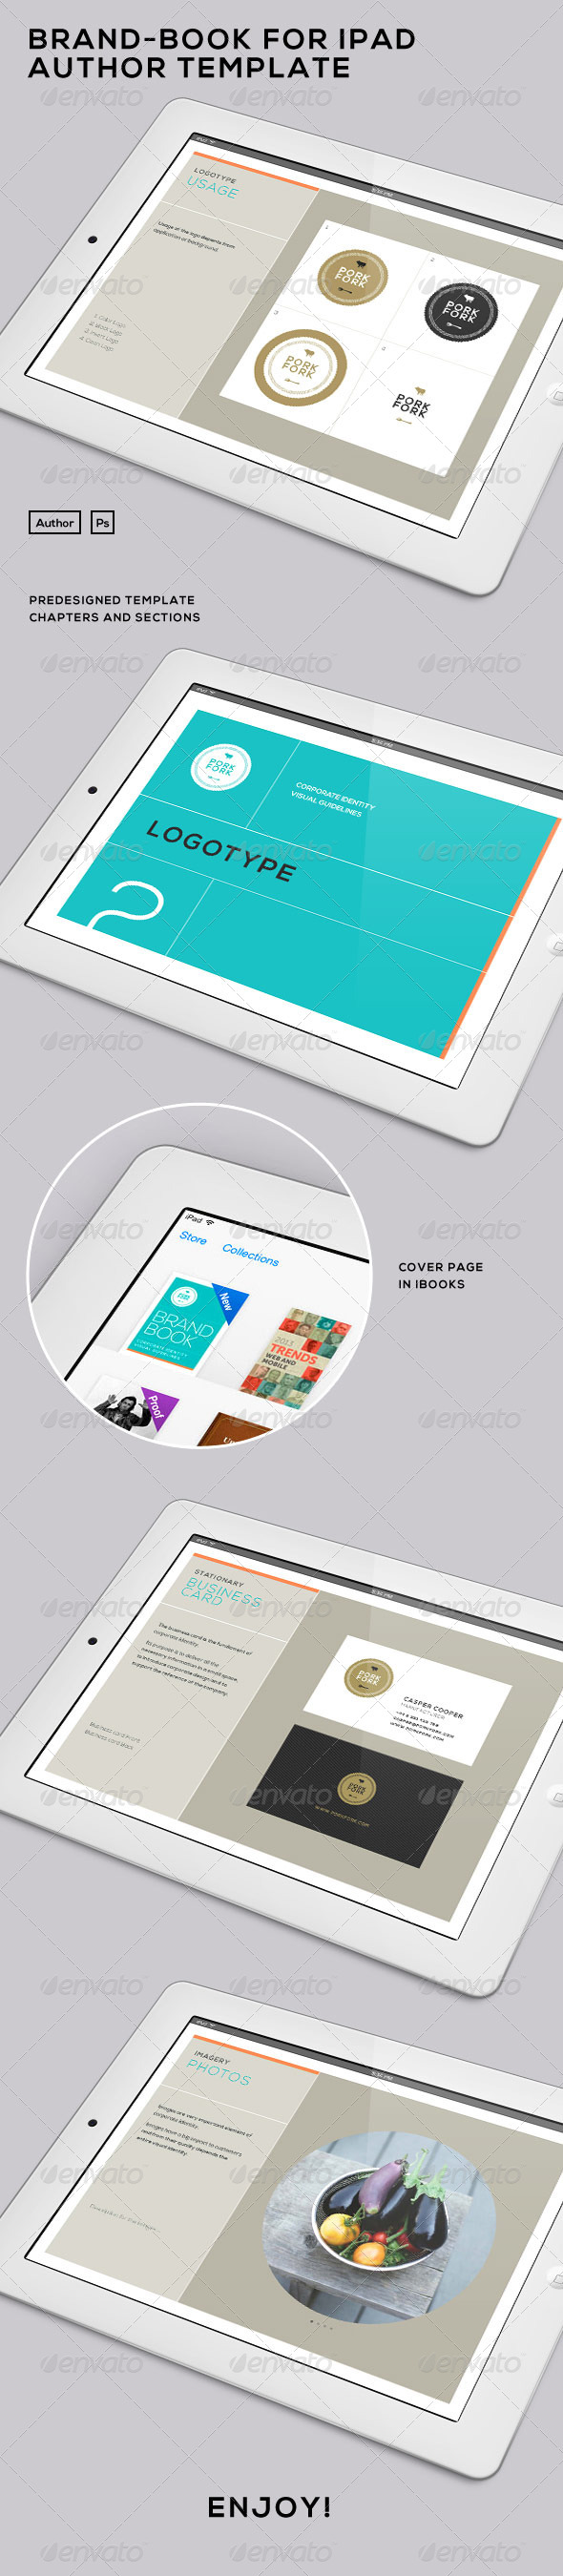 Brand Book for iPad - iBooks Author Template - Digital Books ePublishing